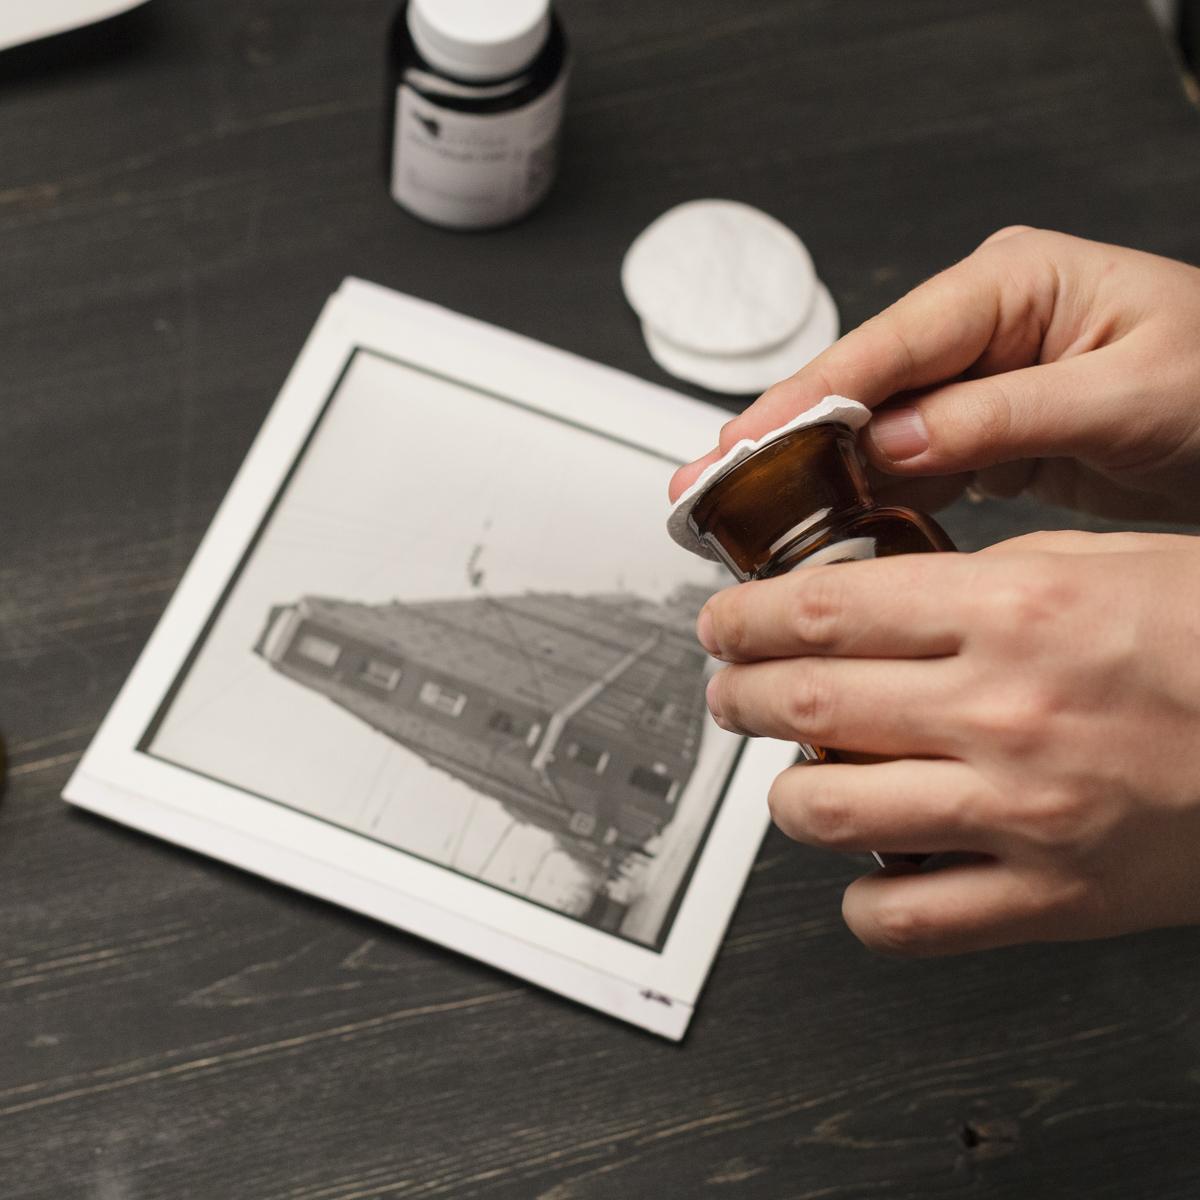 Нанесение матового лака на отпечаток